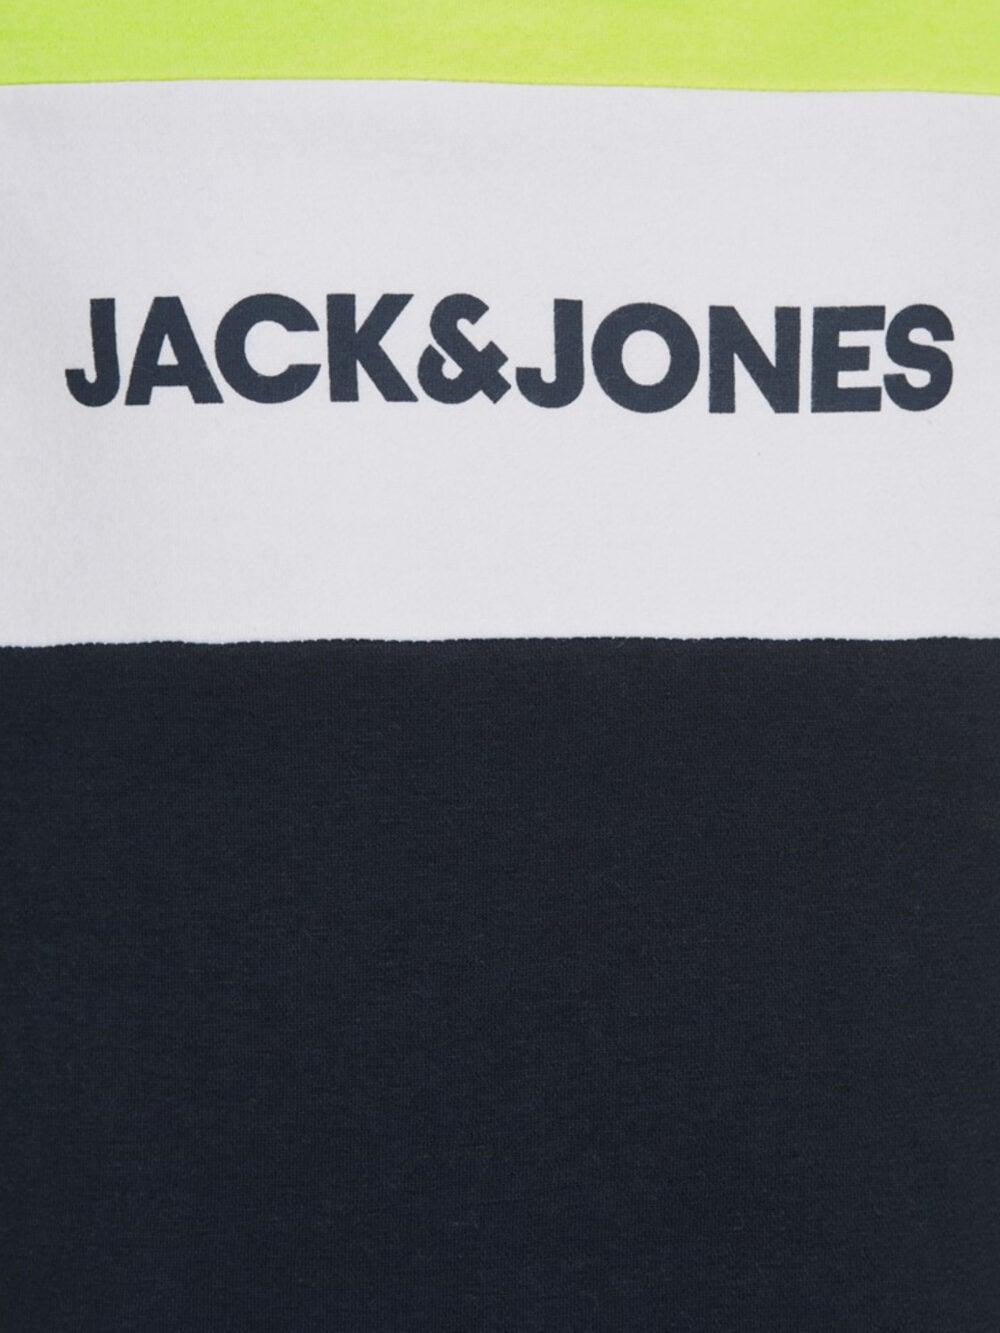 Jack & Jones Junior Neon Logo Blocking Tee Safety Yellow